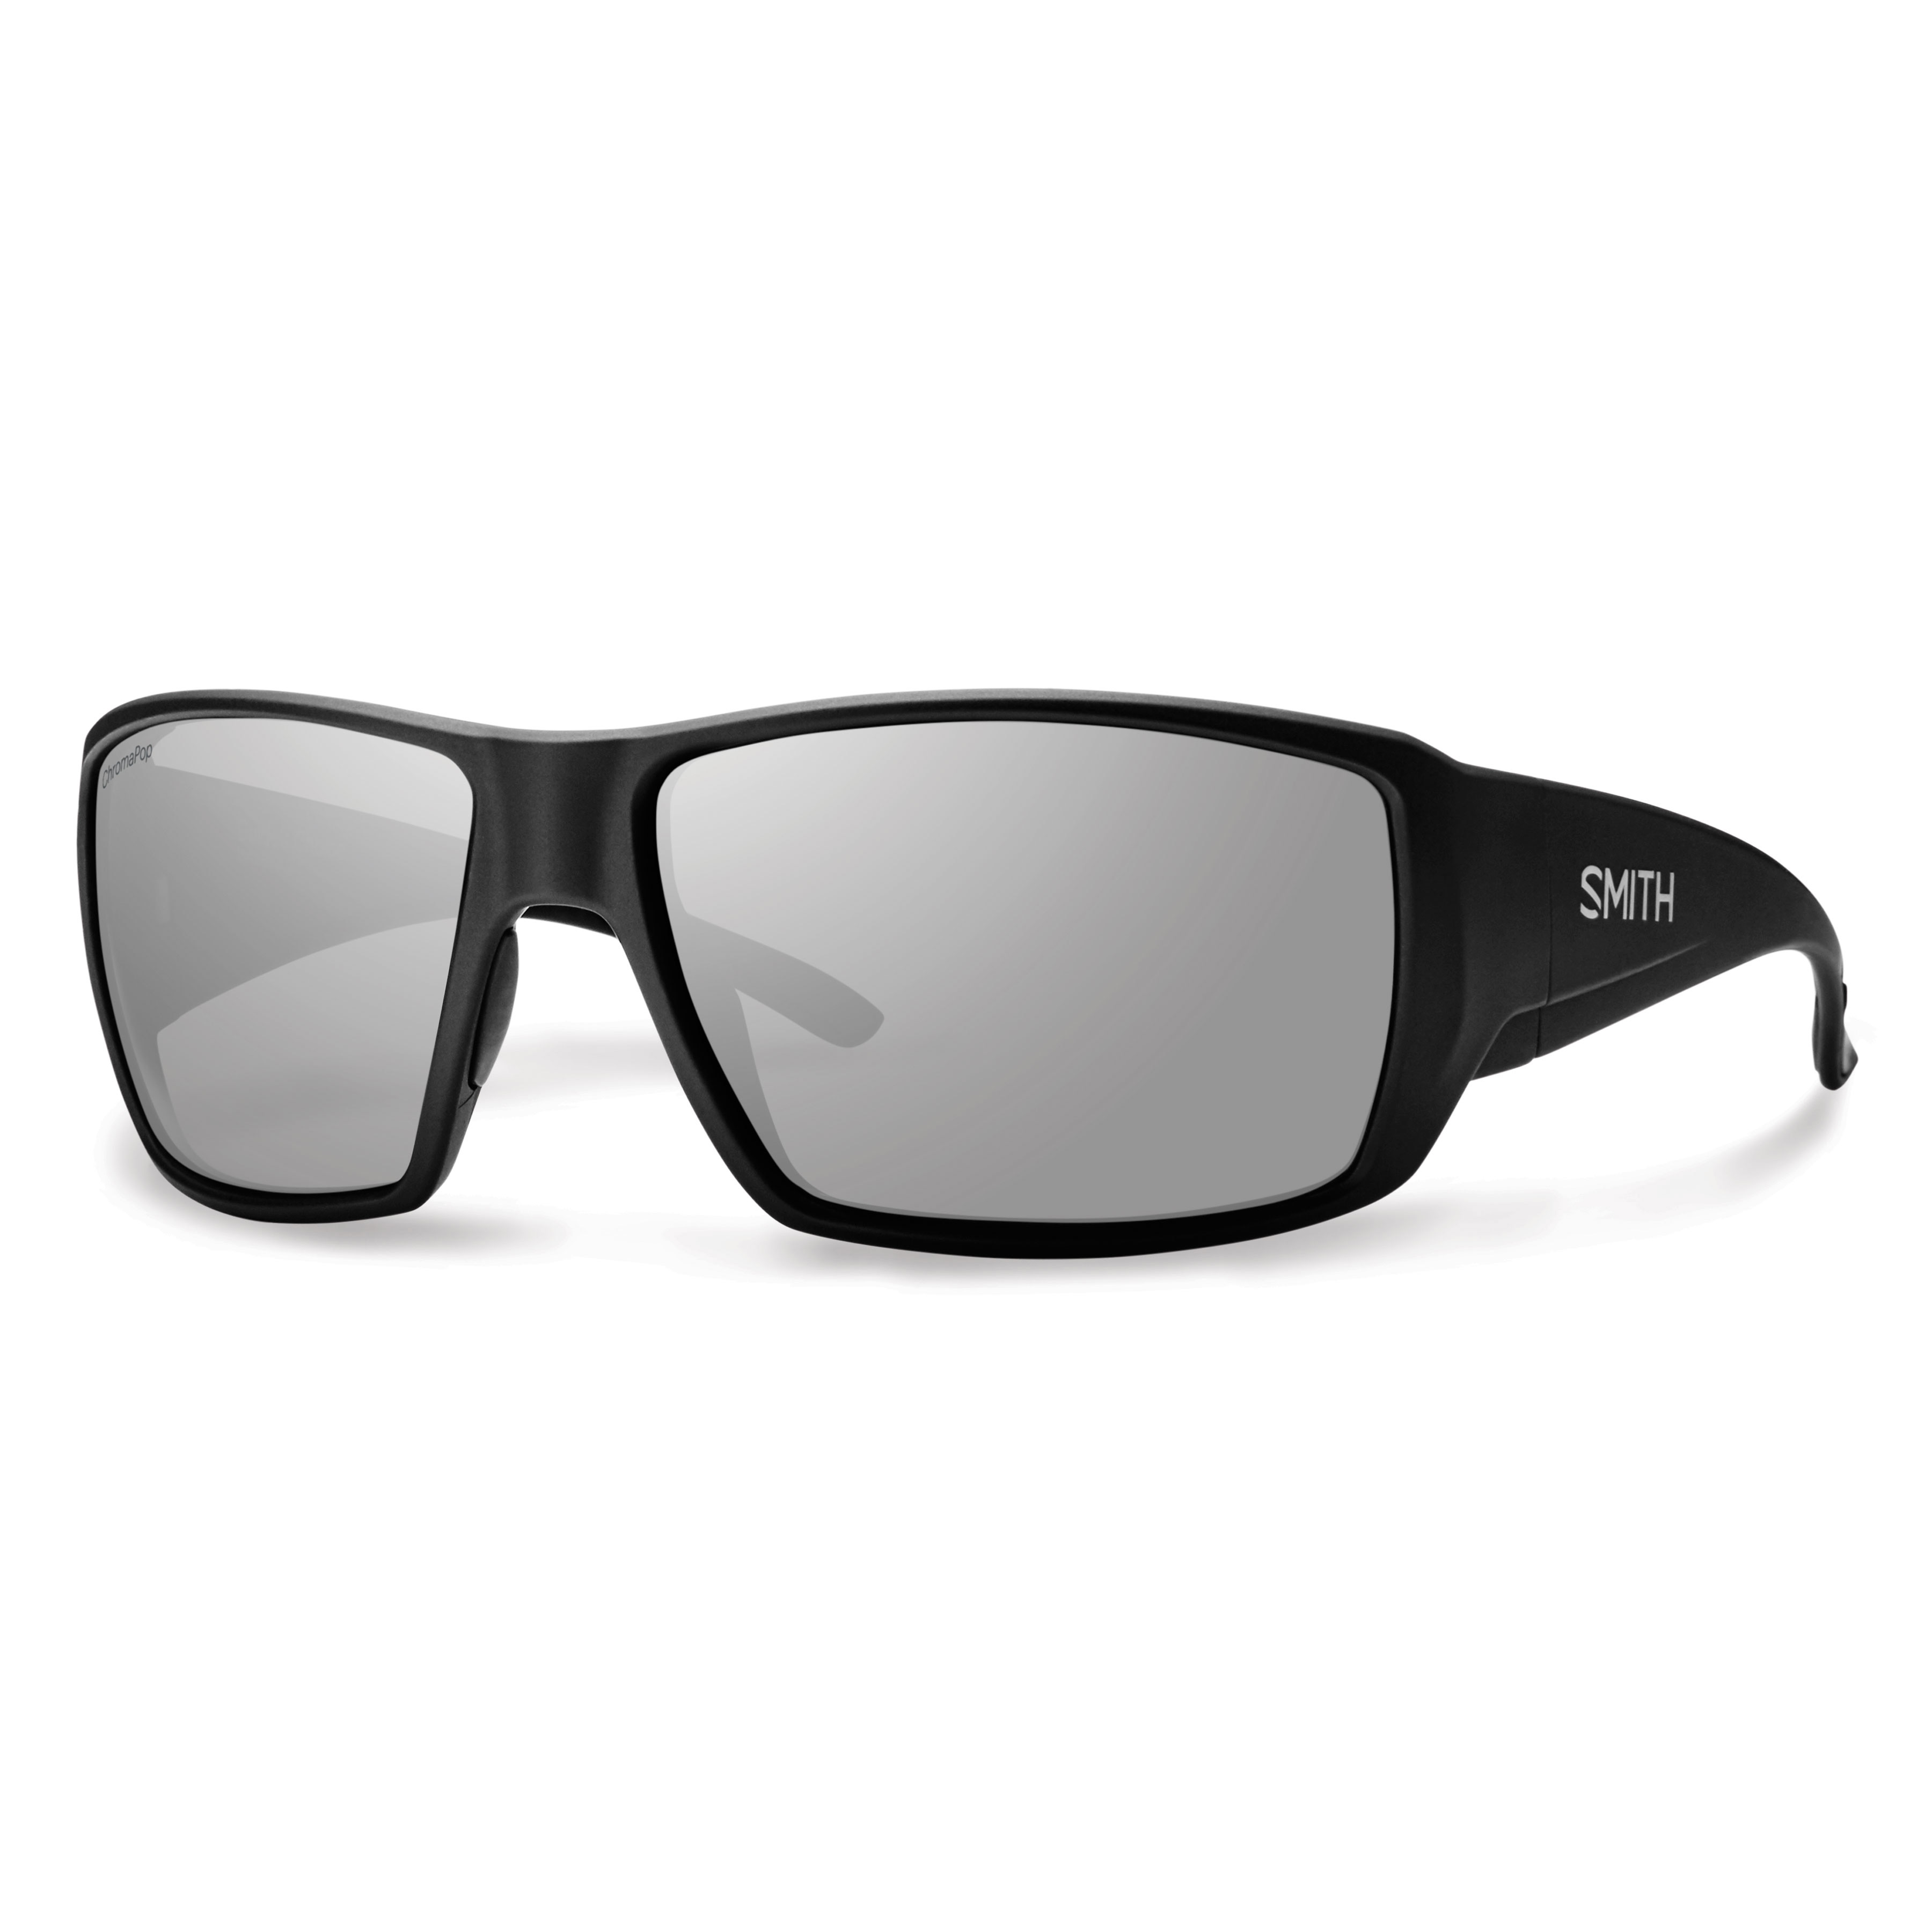 304ff64196 Smith – GUIDE S CHOICE – Matte Black   ChromaPop+ Polarized Platinum ...